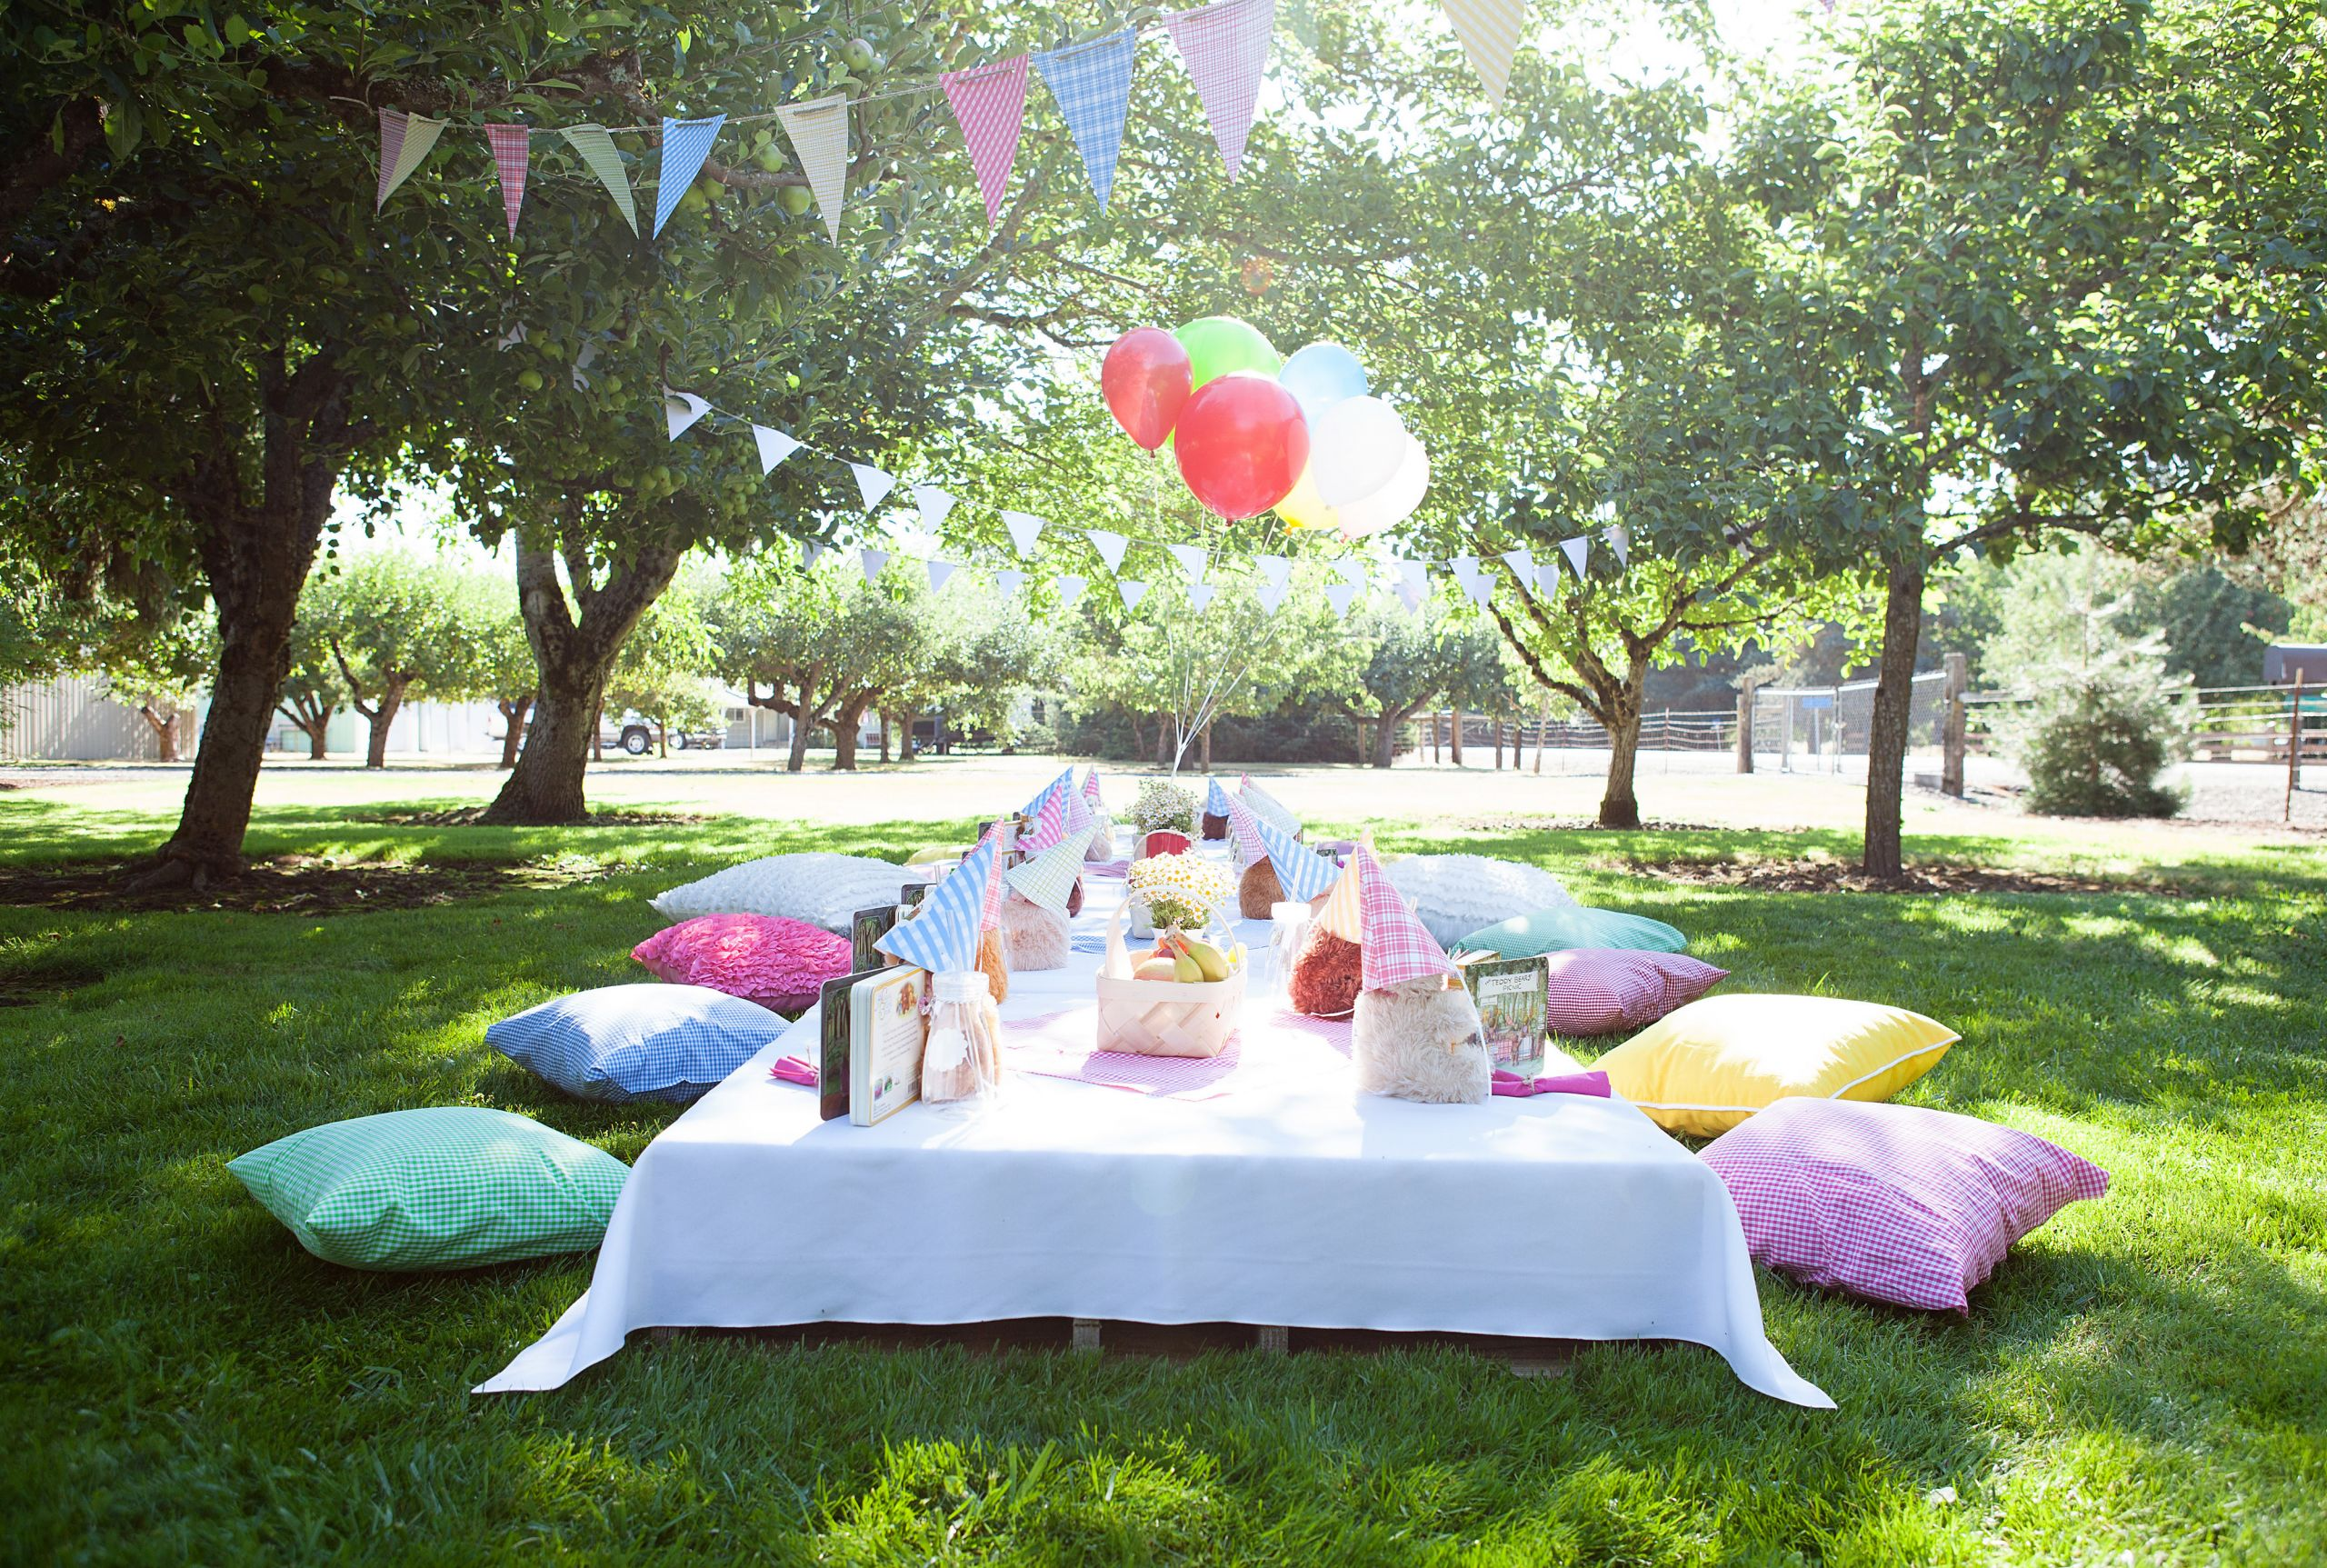 Picnic Birthday Party Ideas  Teddy Bear Picnic Birthday Party